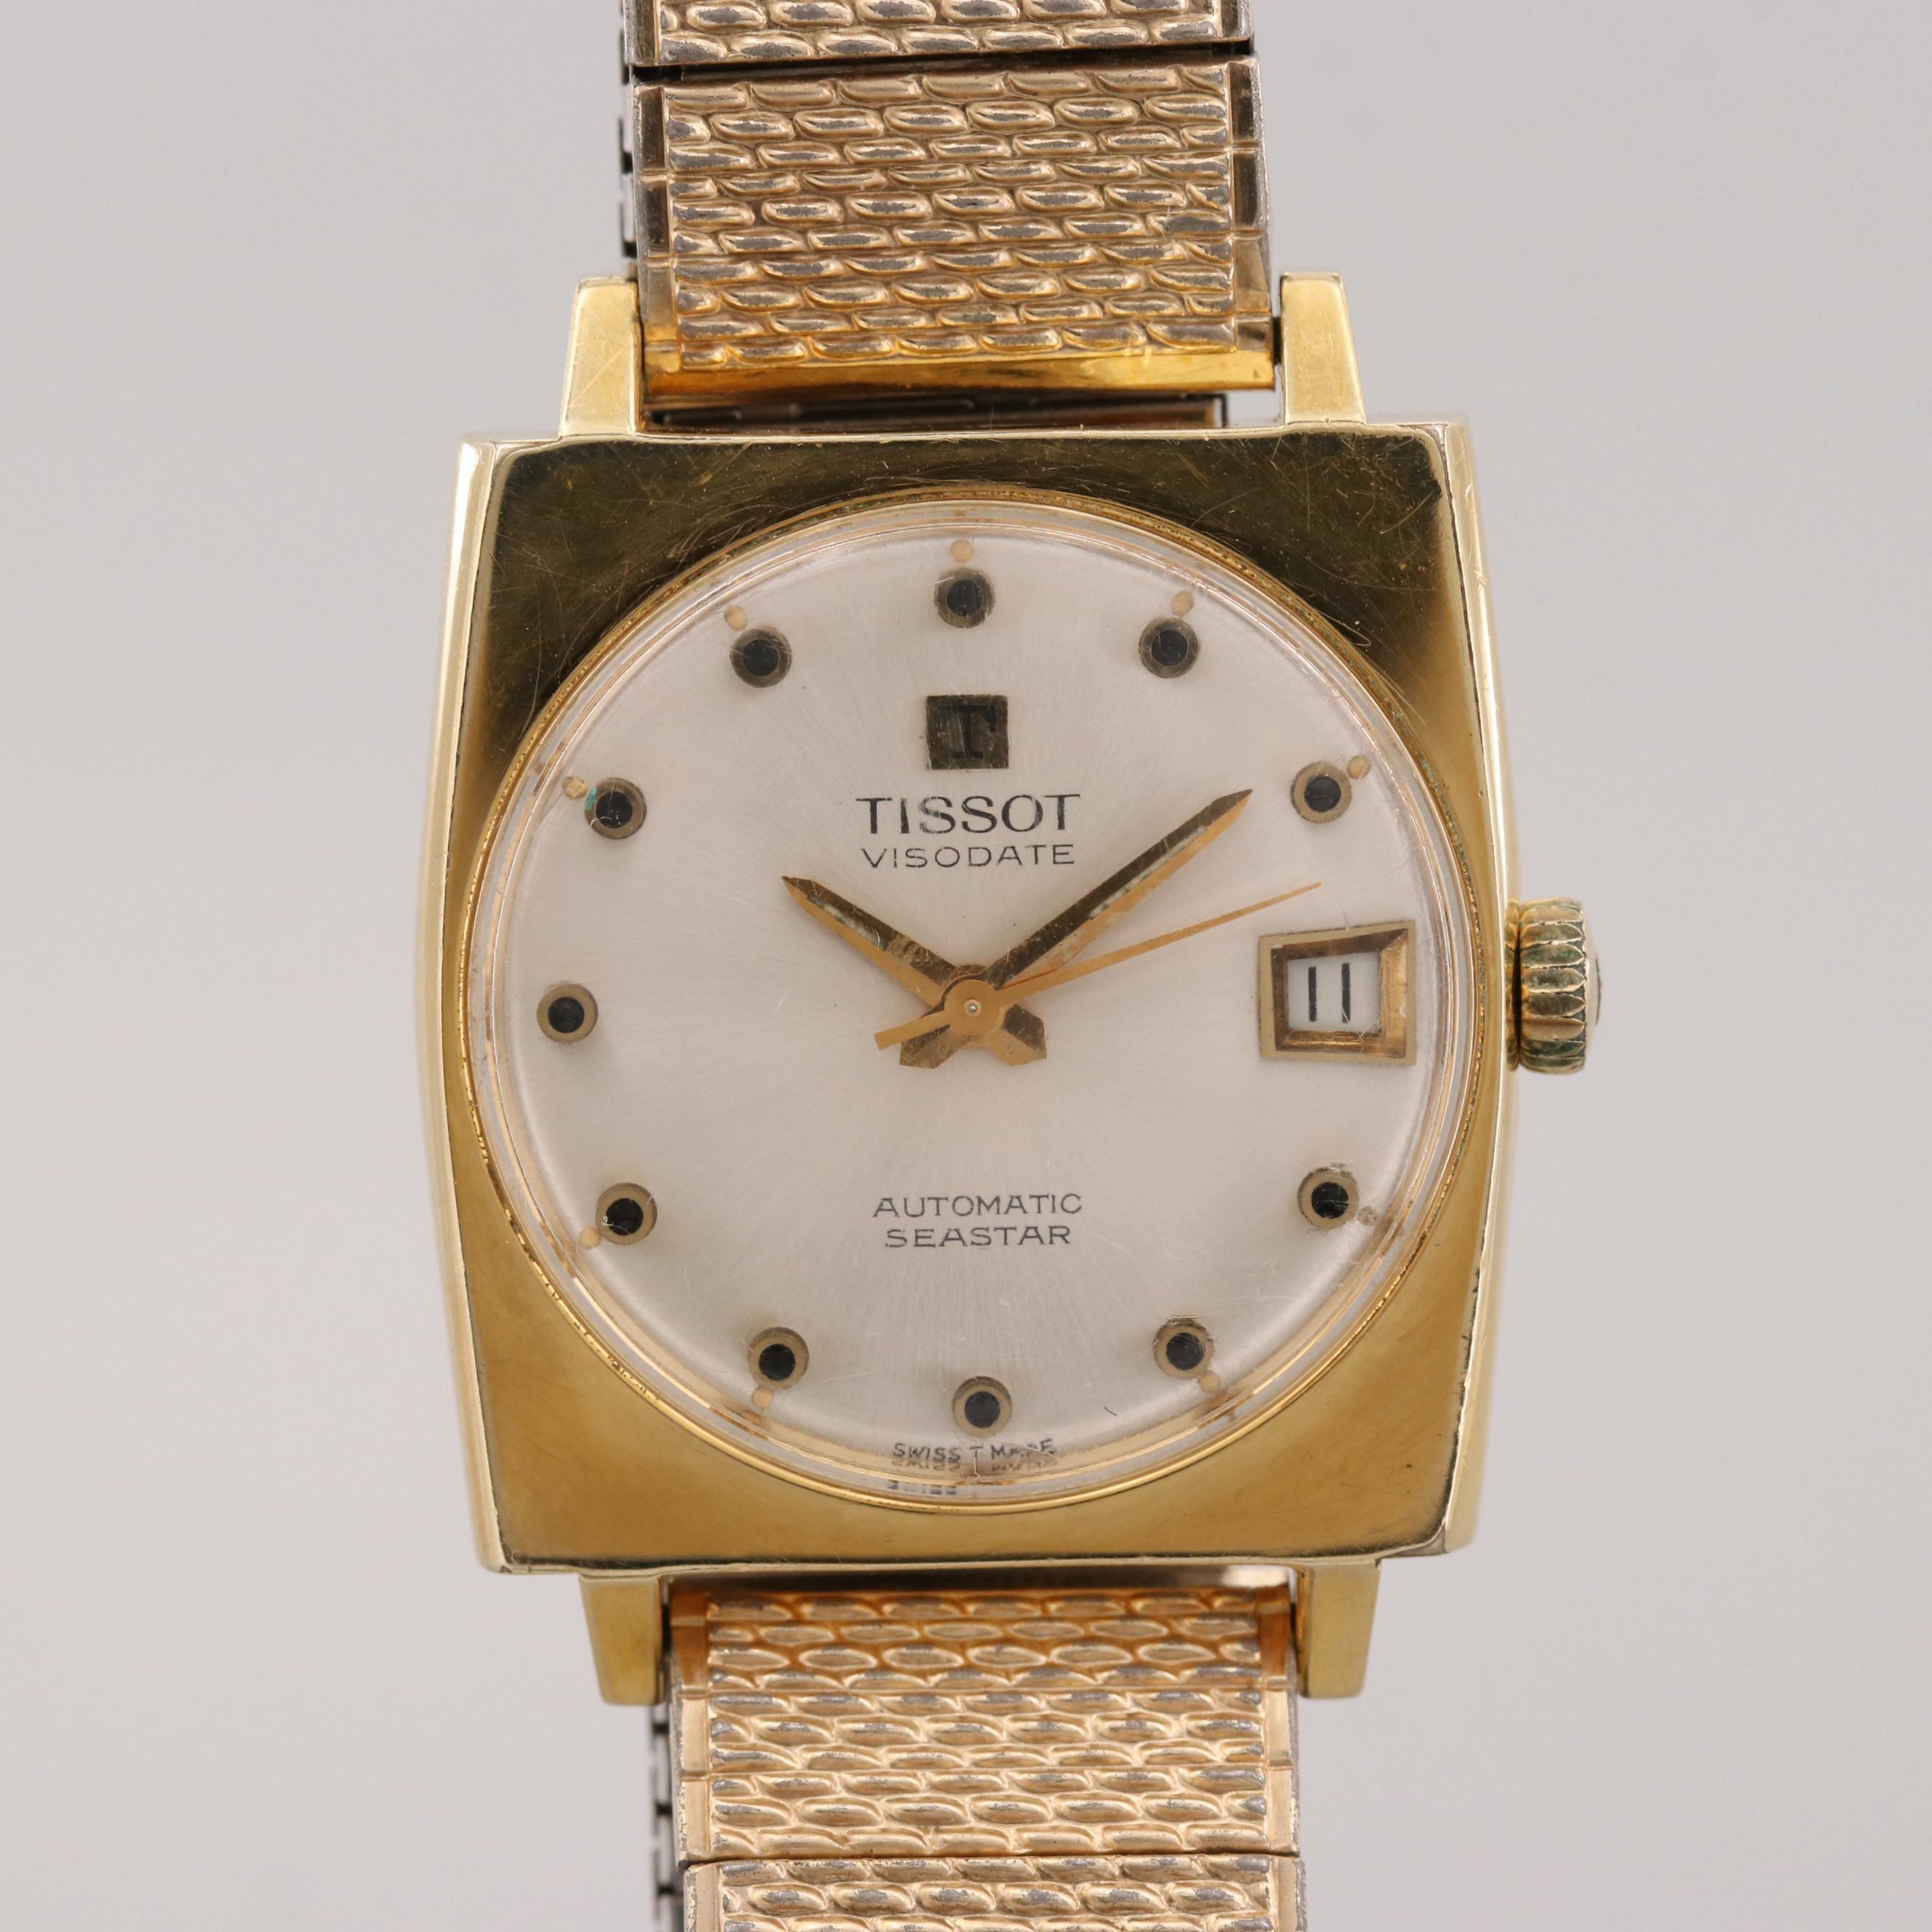 Vintage Tissot Seastar Visodate Gold Tone Automatic Wristwatch